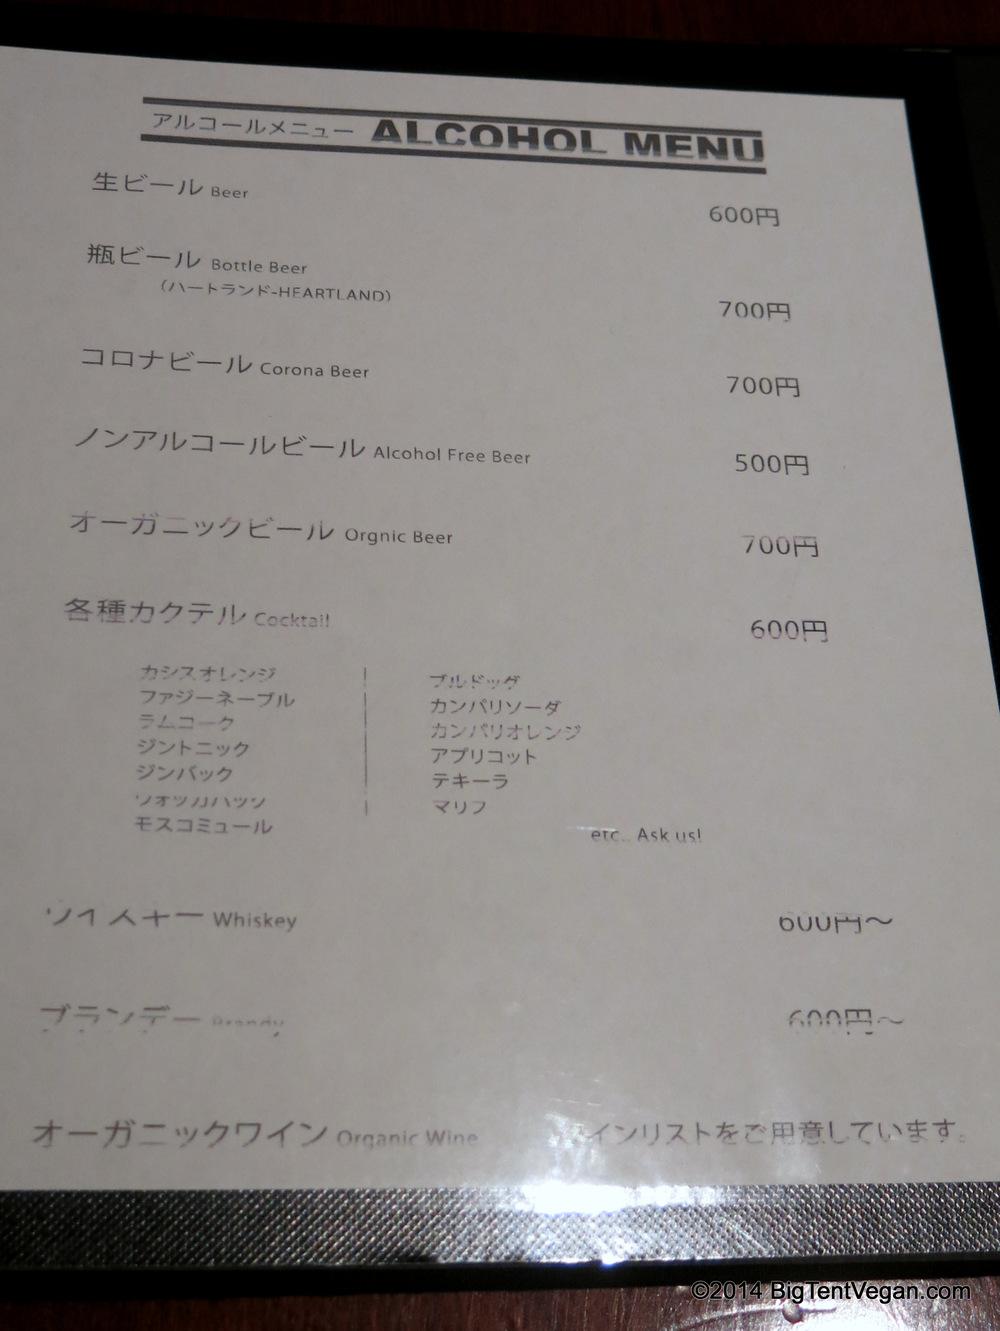 IMG_6619 - Copy.JPG